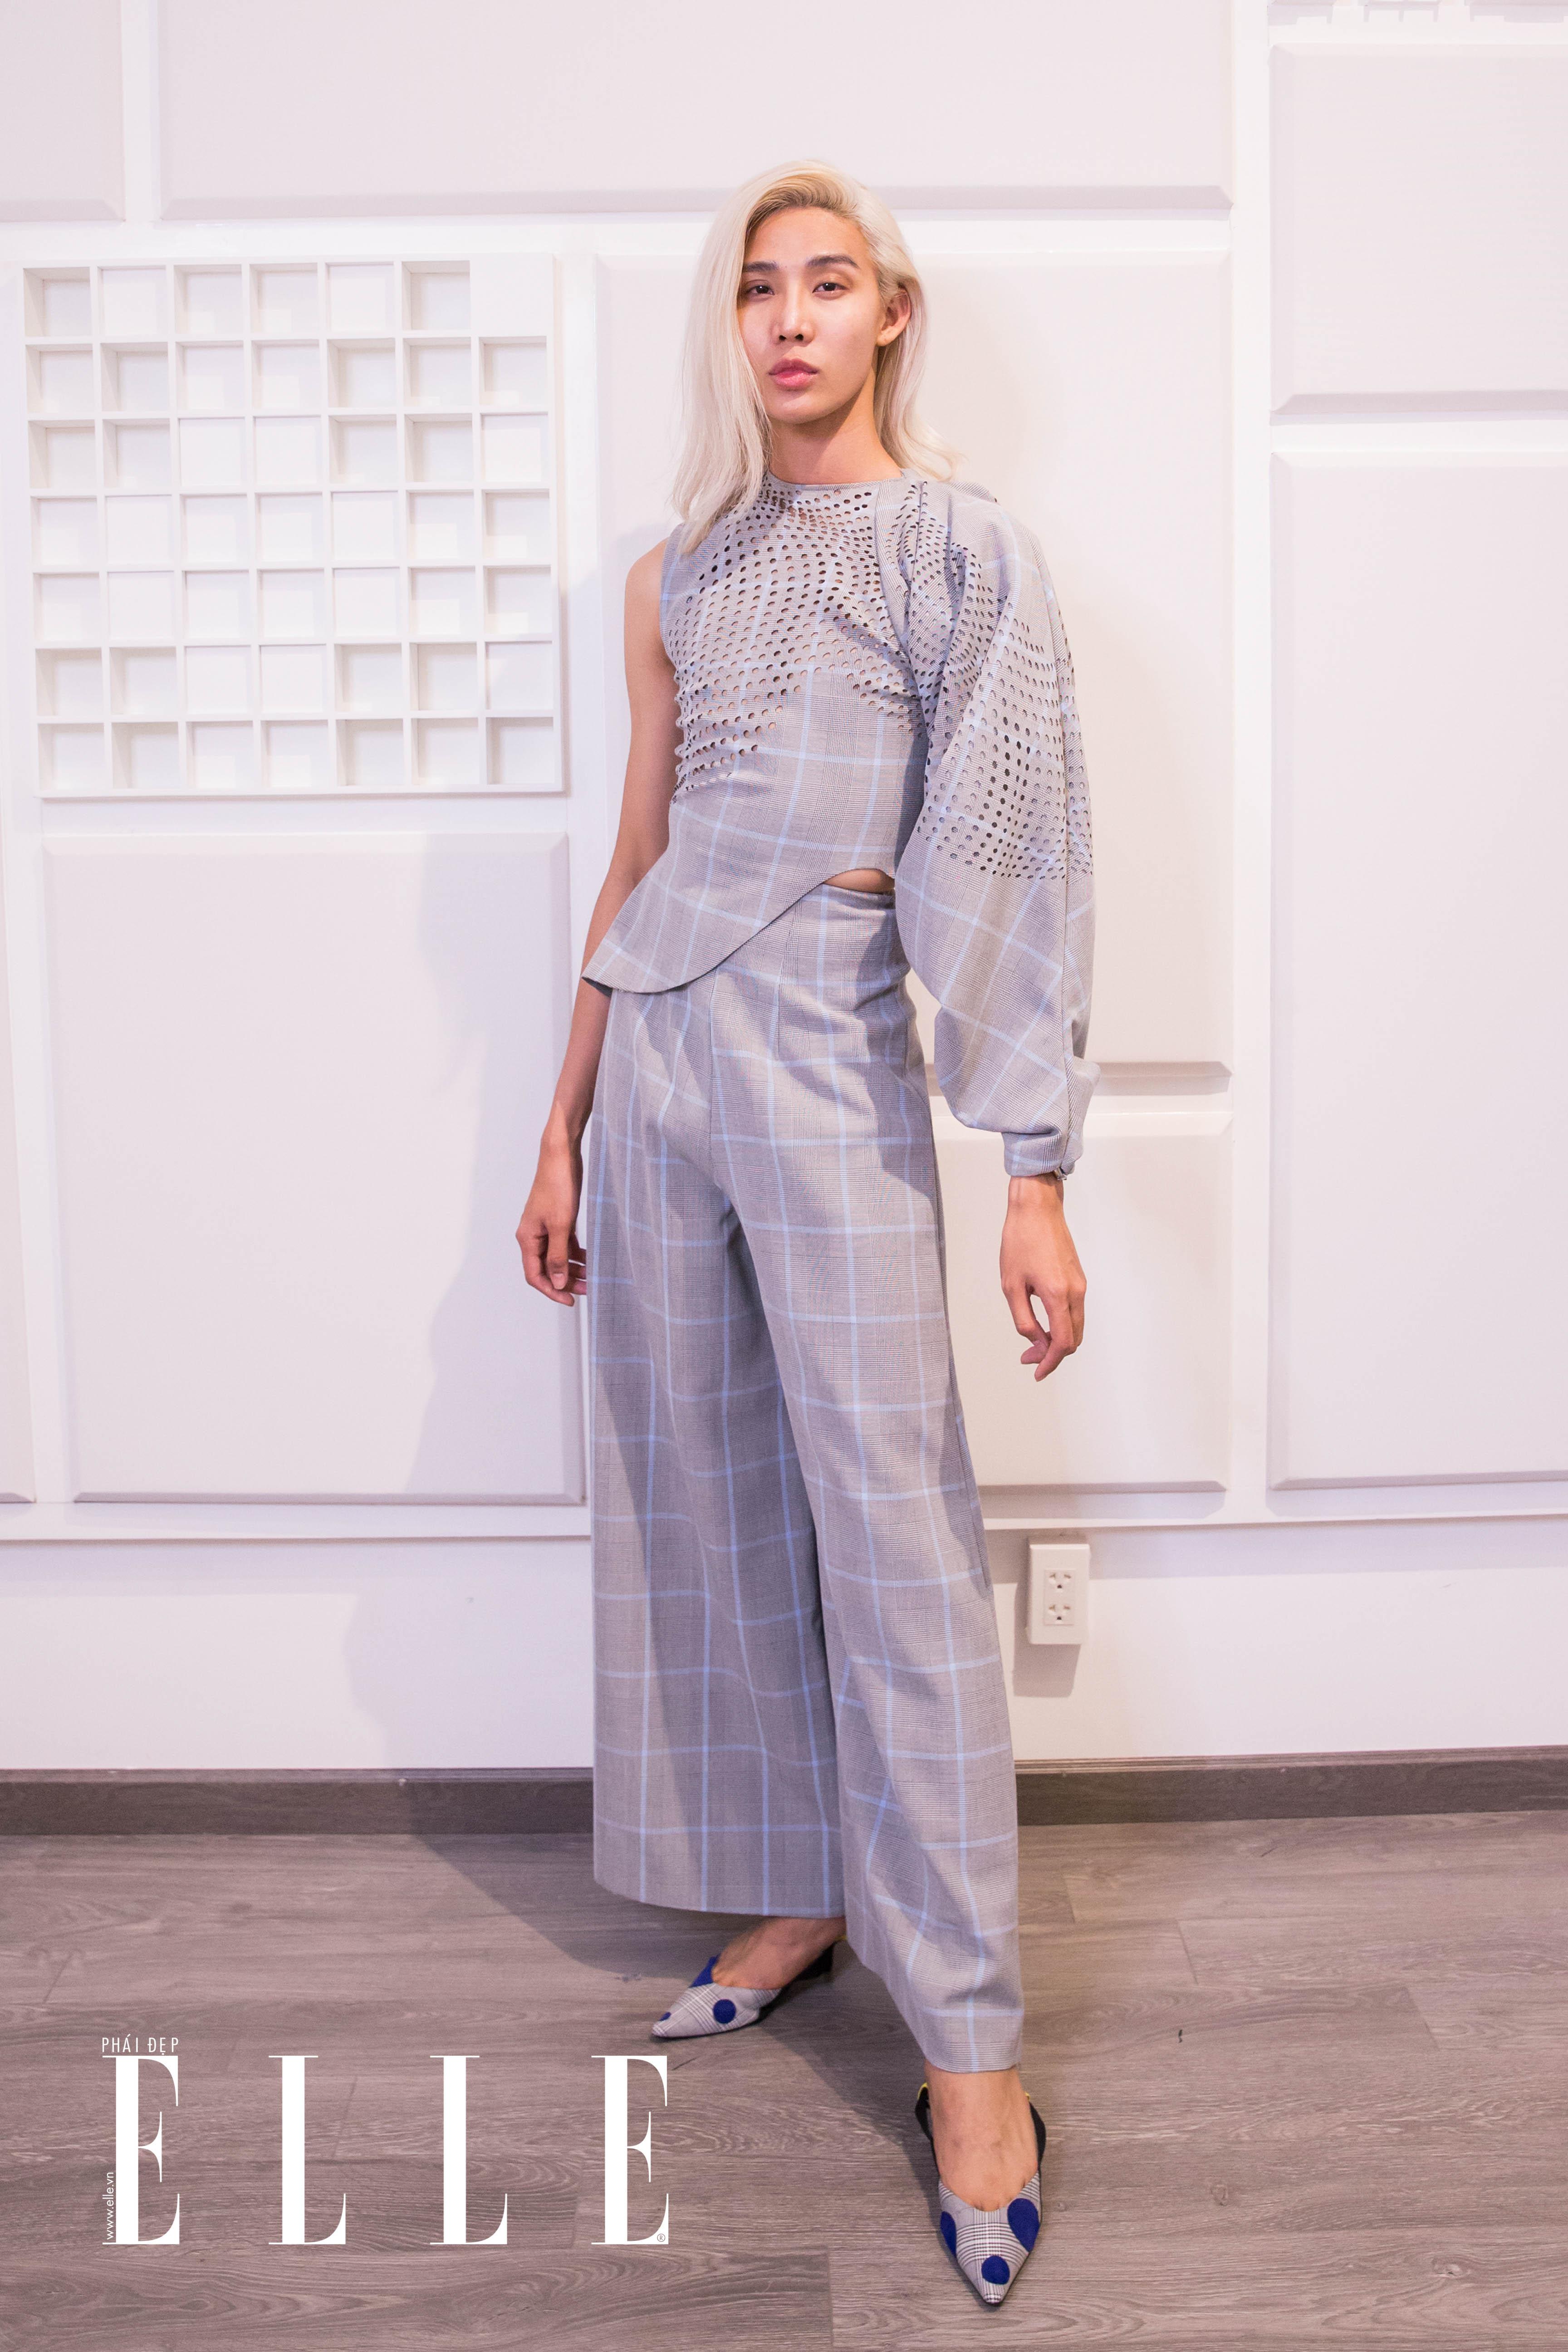 mid nguyễn elle fashion runway show